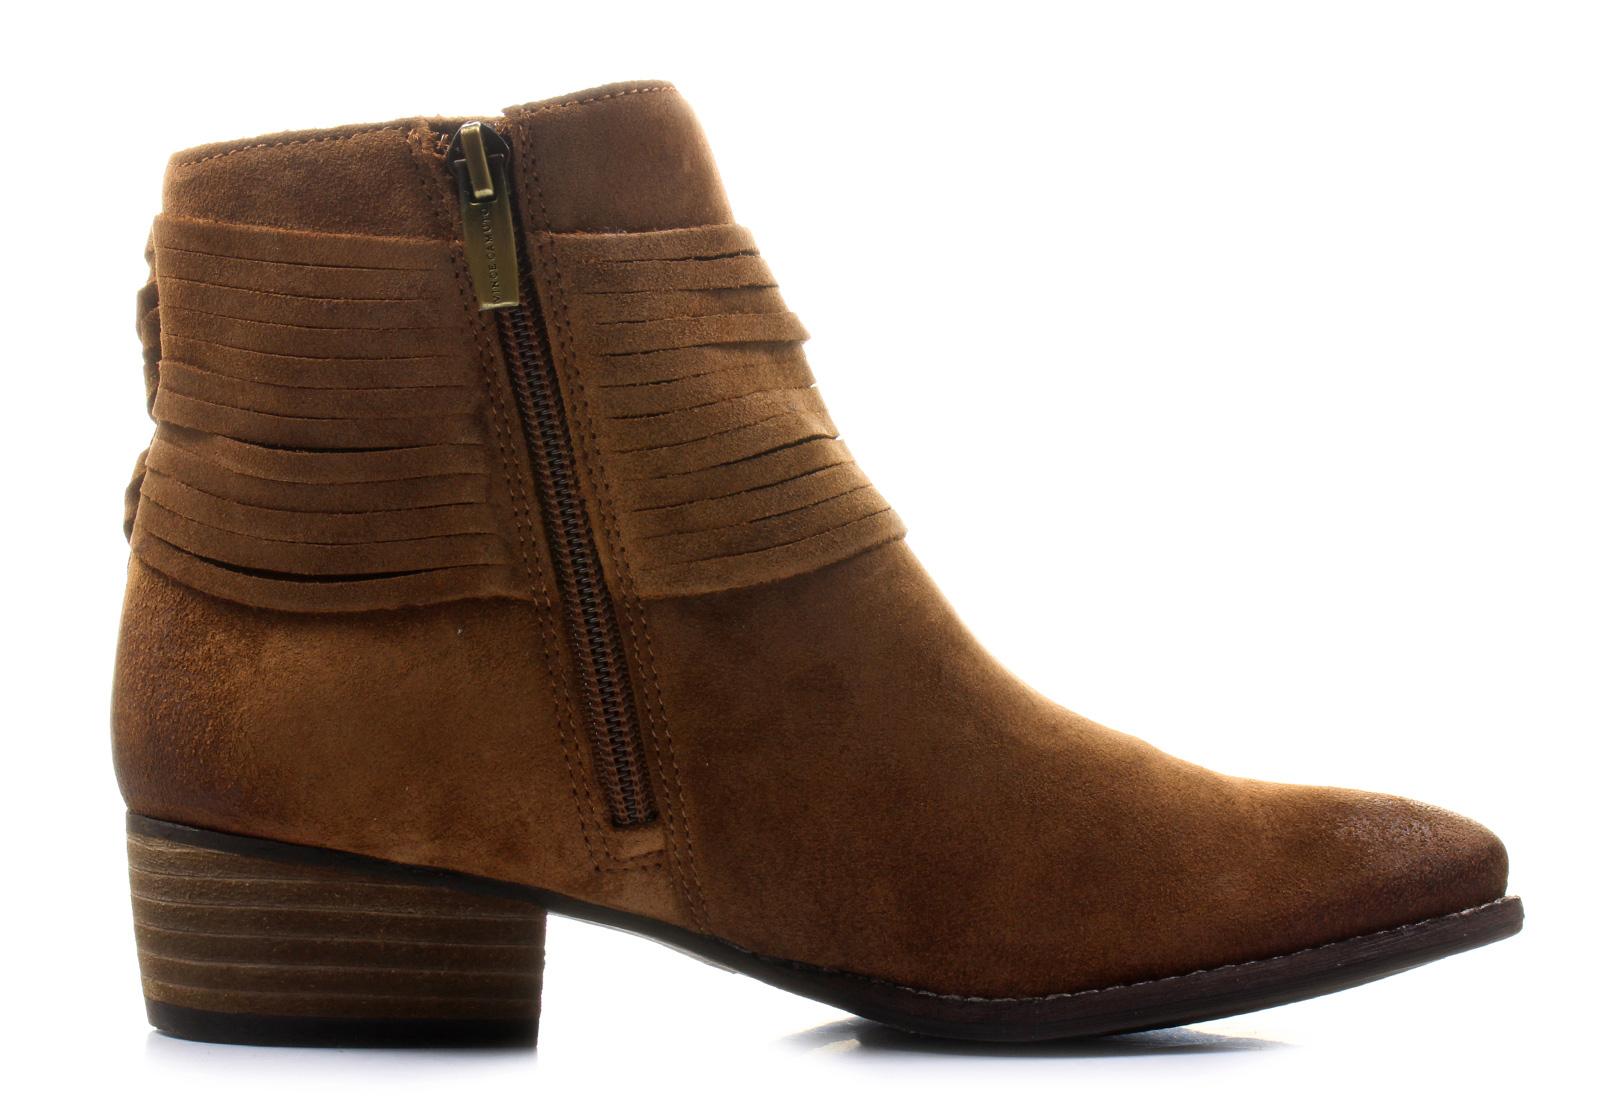 vince camuto boots saree saree cho shop for